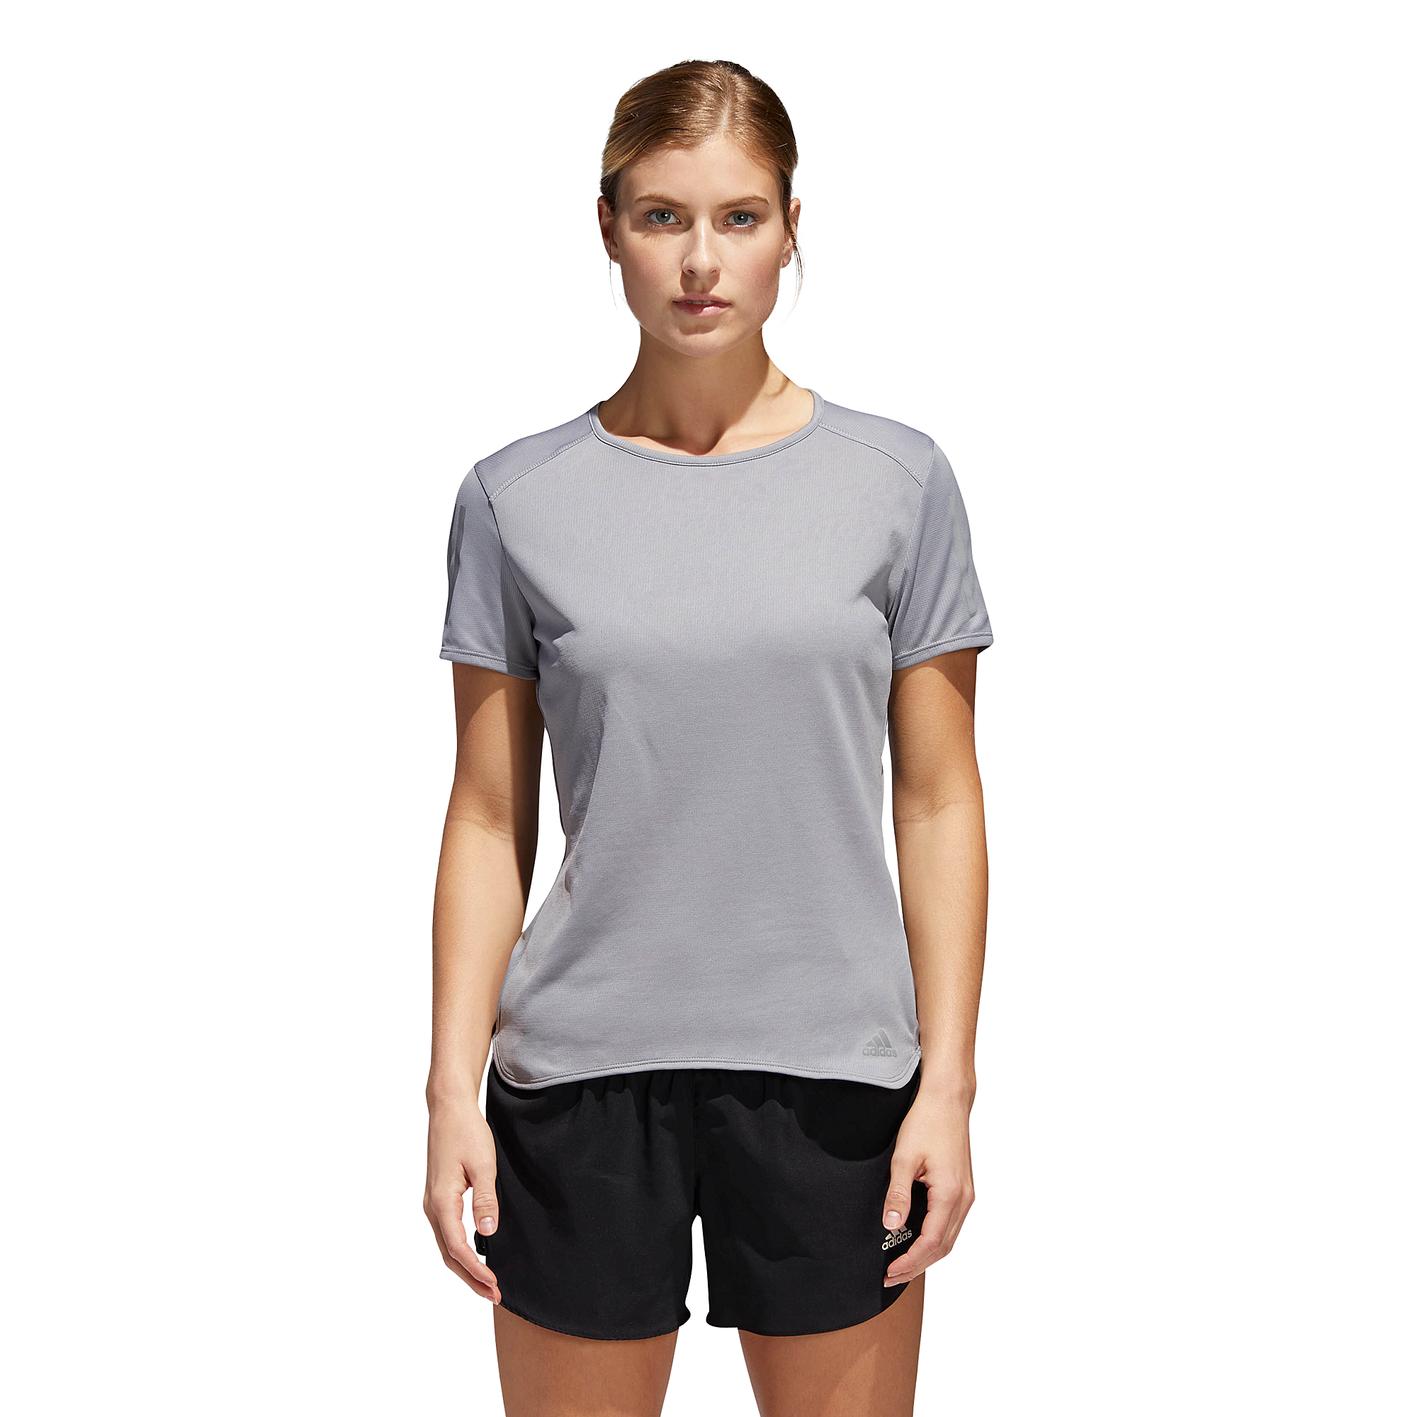 8015f1072df adidas Response Short Sleeve T-Shirt - Women's - Running - Clothing ...